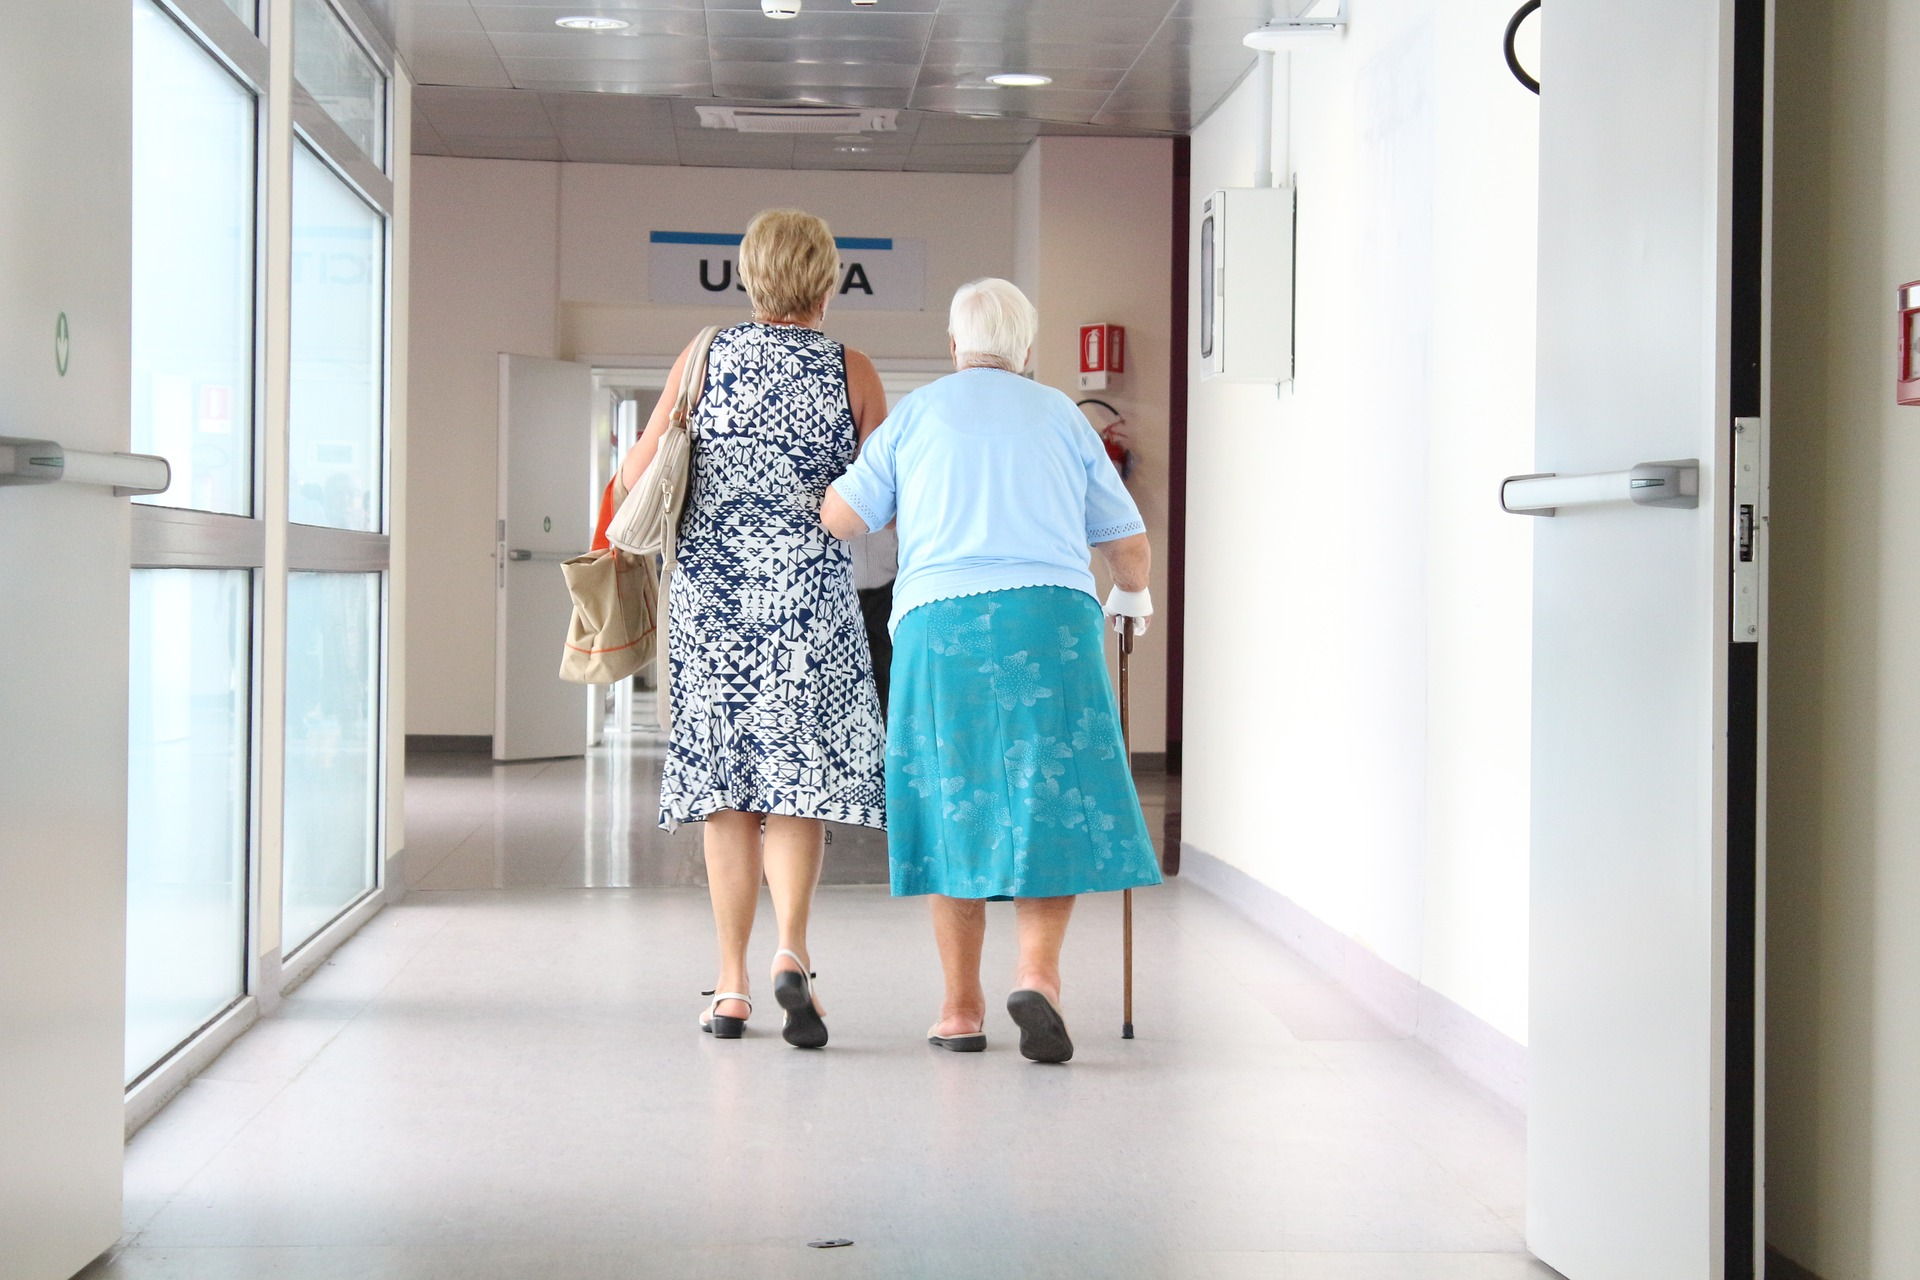 pregled za osteoporozo